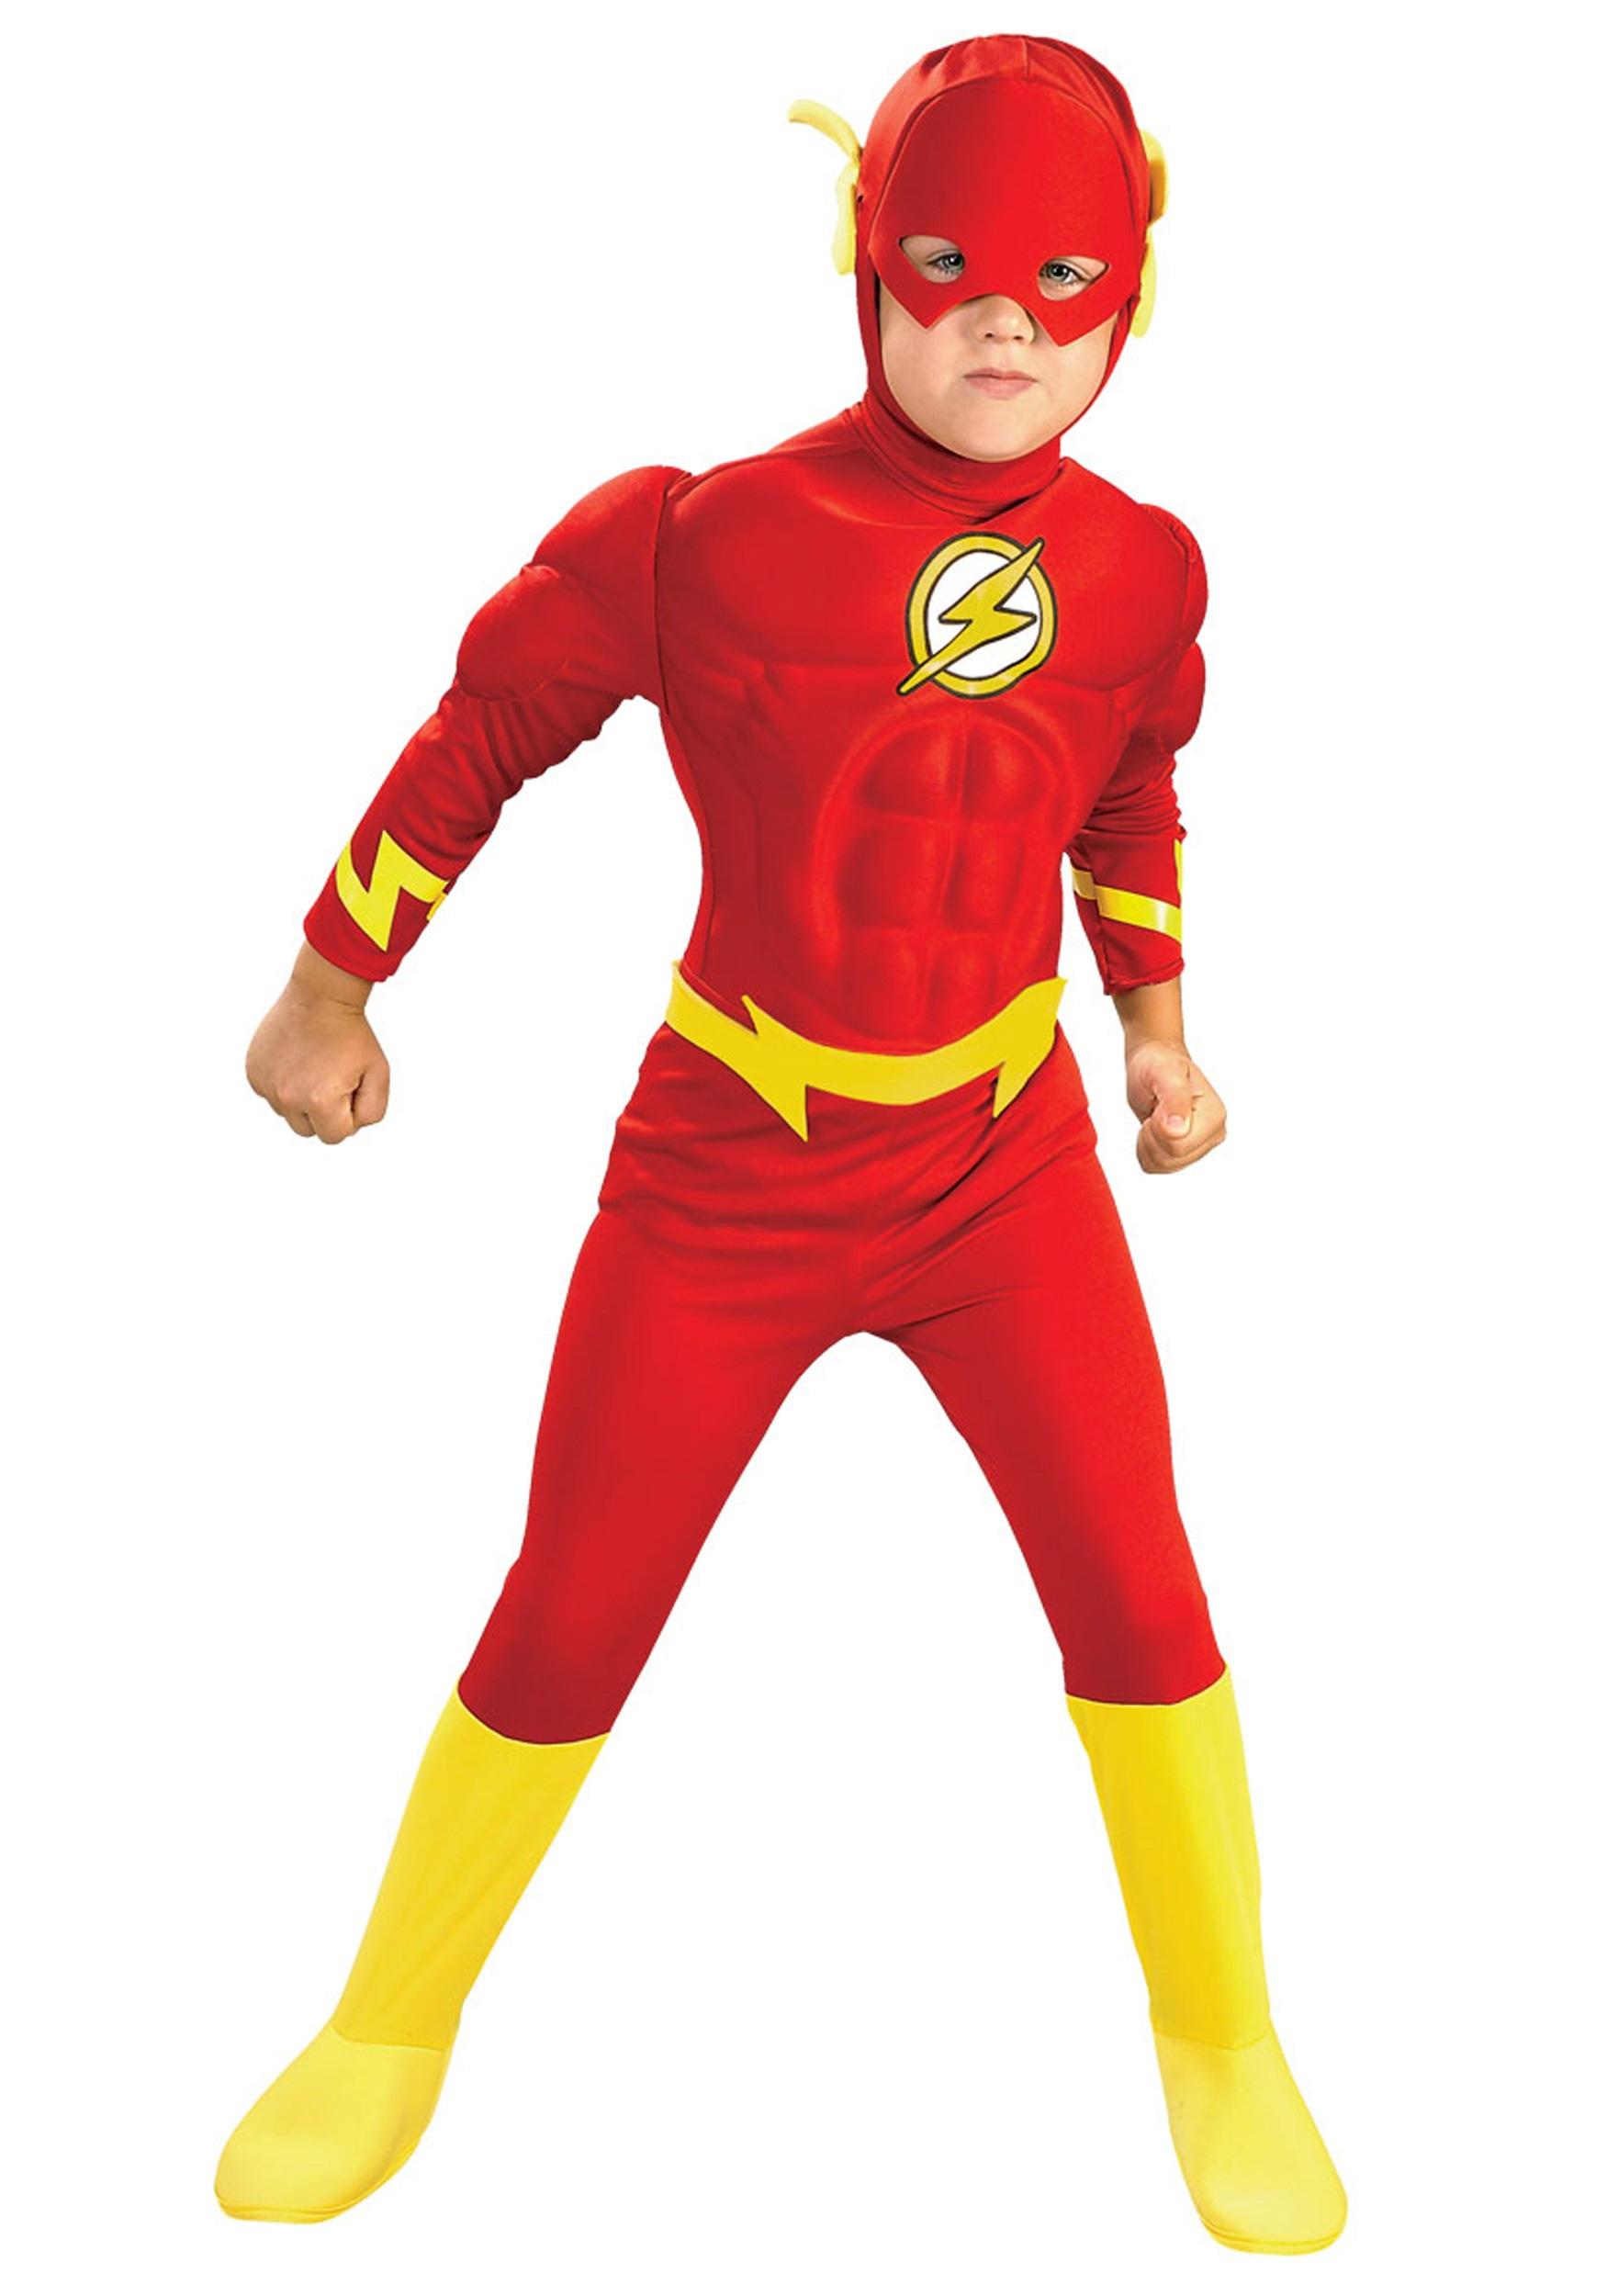 Deluxe Kids Flash Costume RU882308